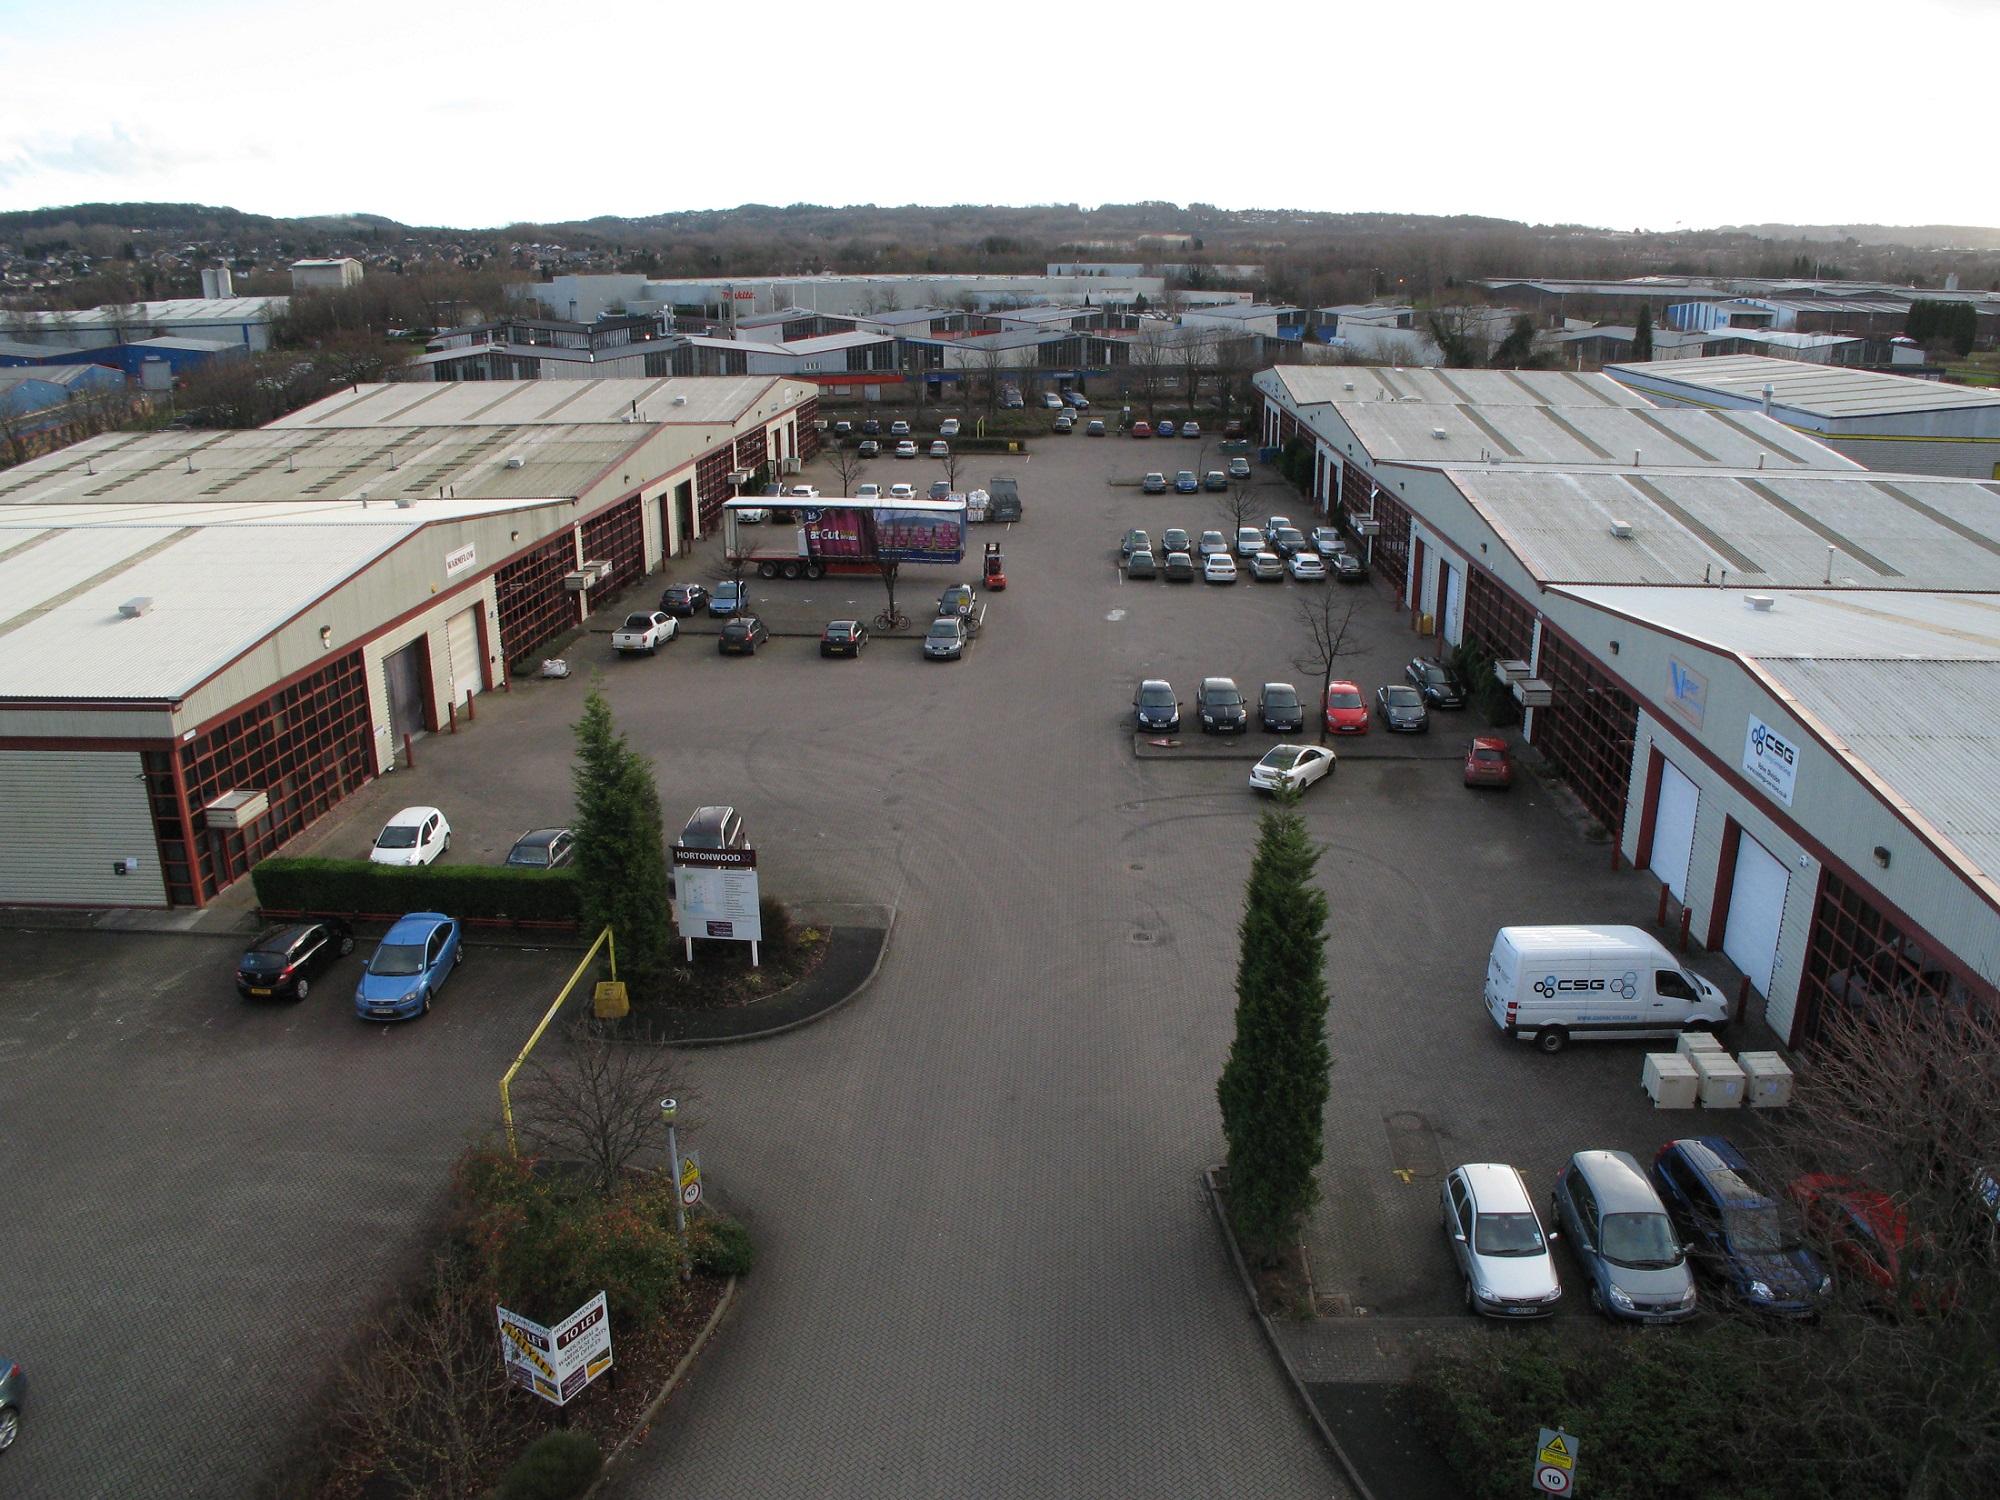 Unit 3 - Hortonwood 32, Telford, Shropshire, TF1 7EU